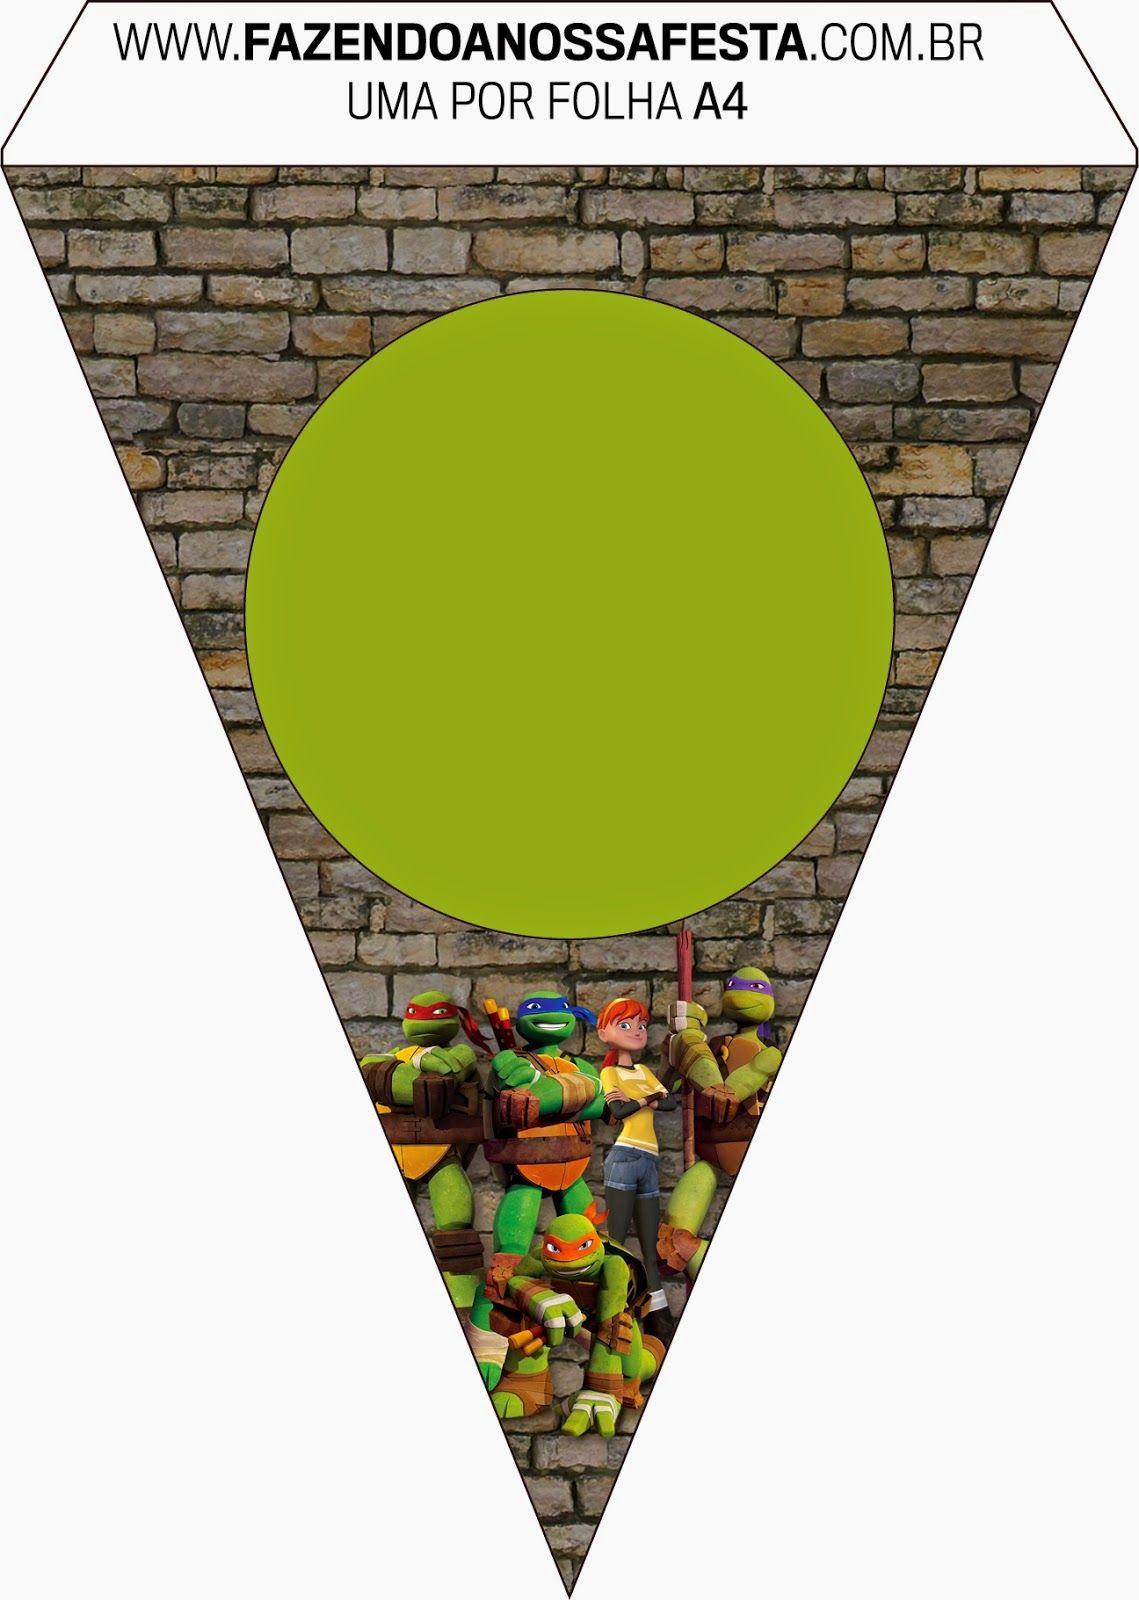 Ninja Turtles Free Party Printables And Invitations. | Party - Free Printable Ninja Turtle Birthday Banner